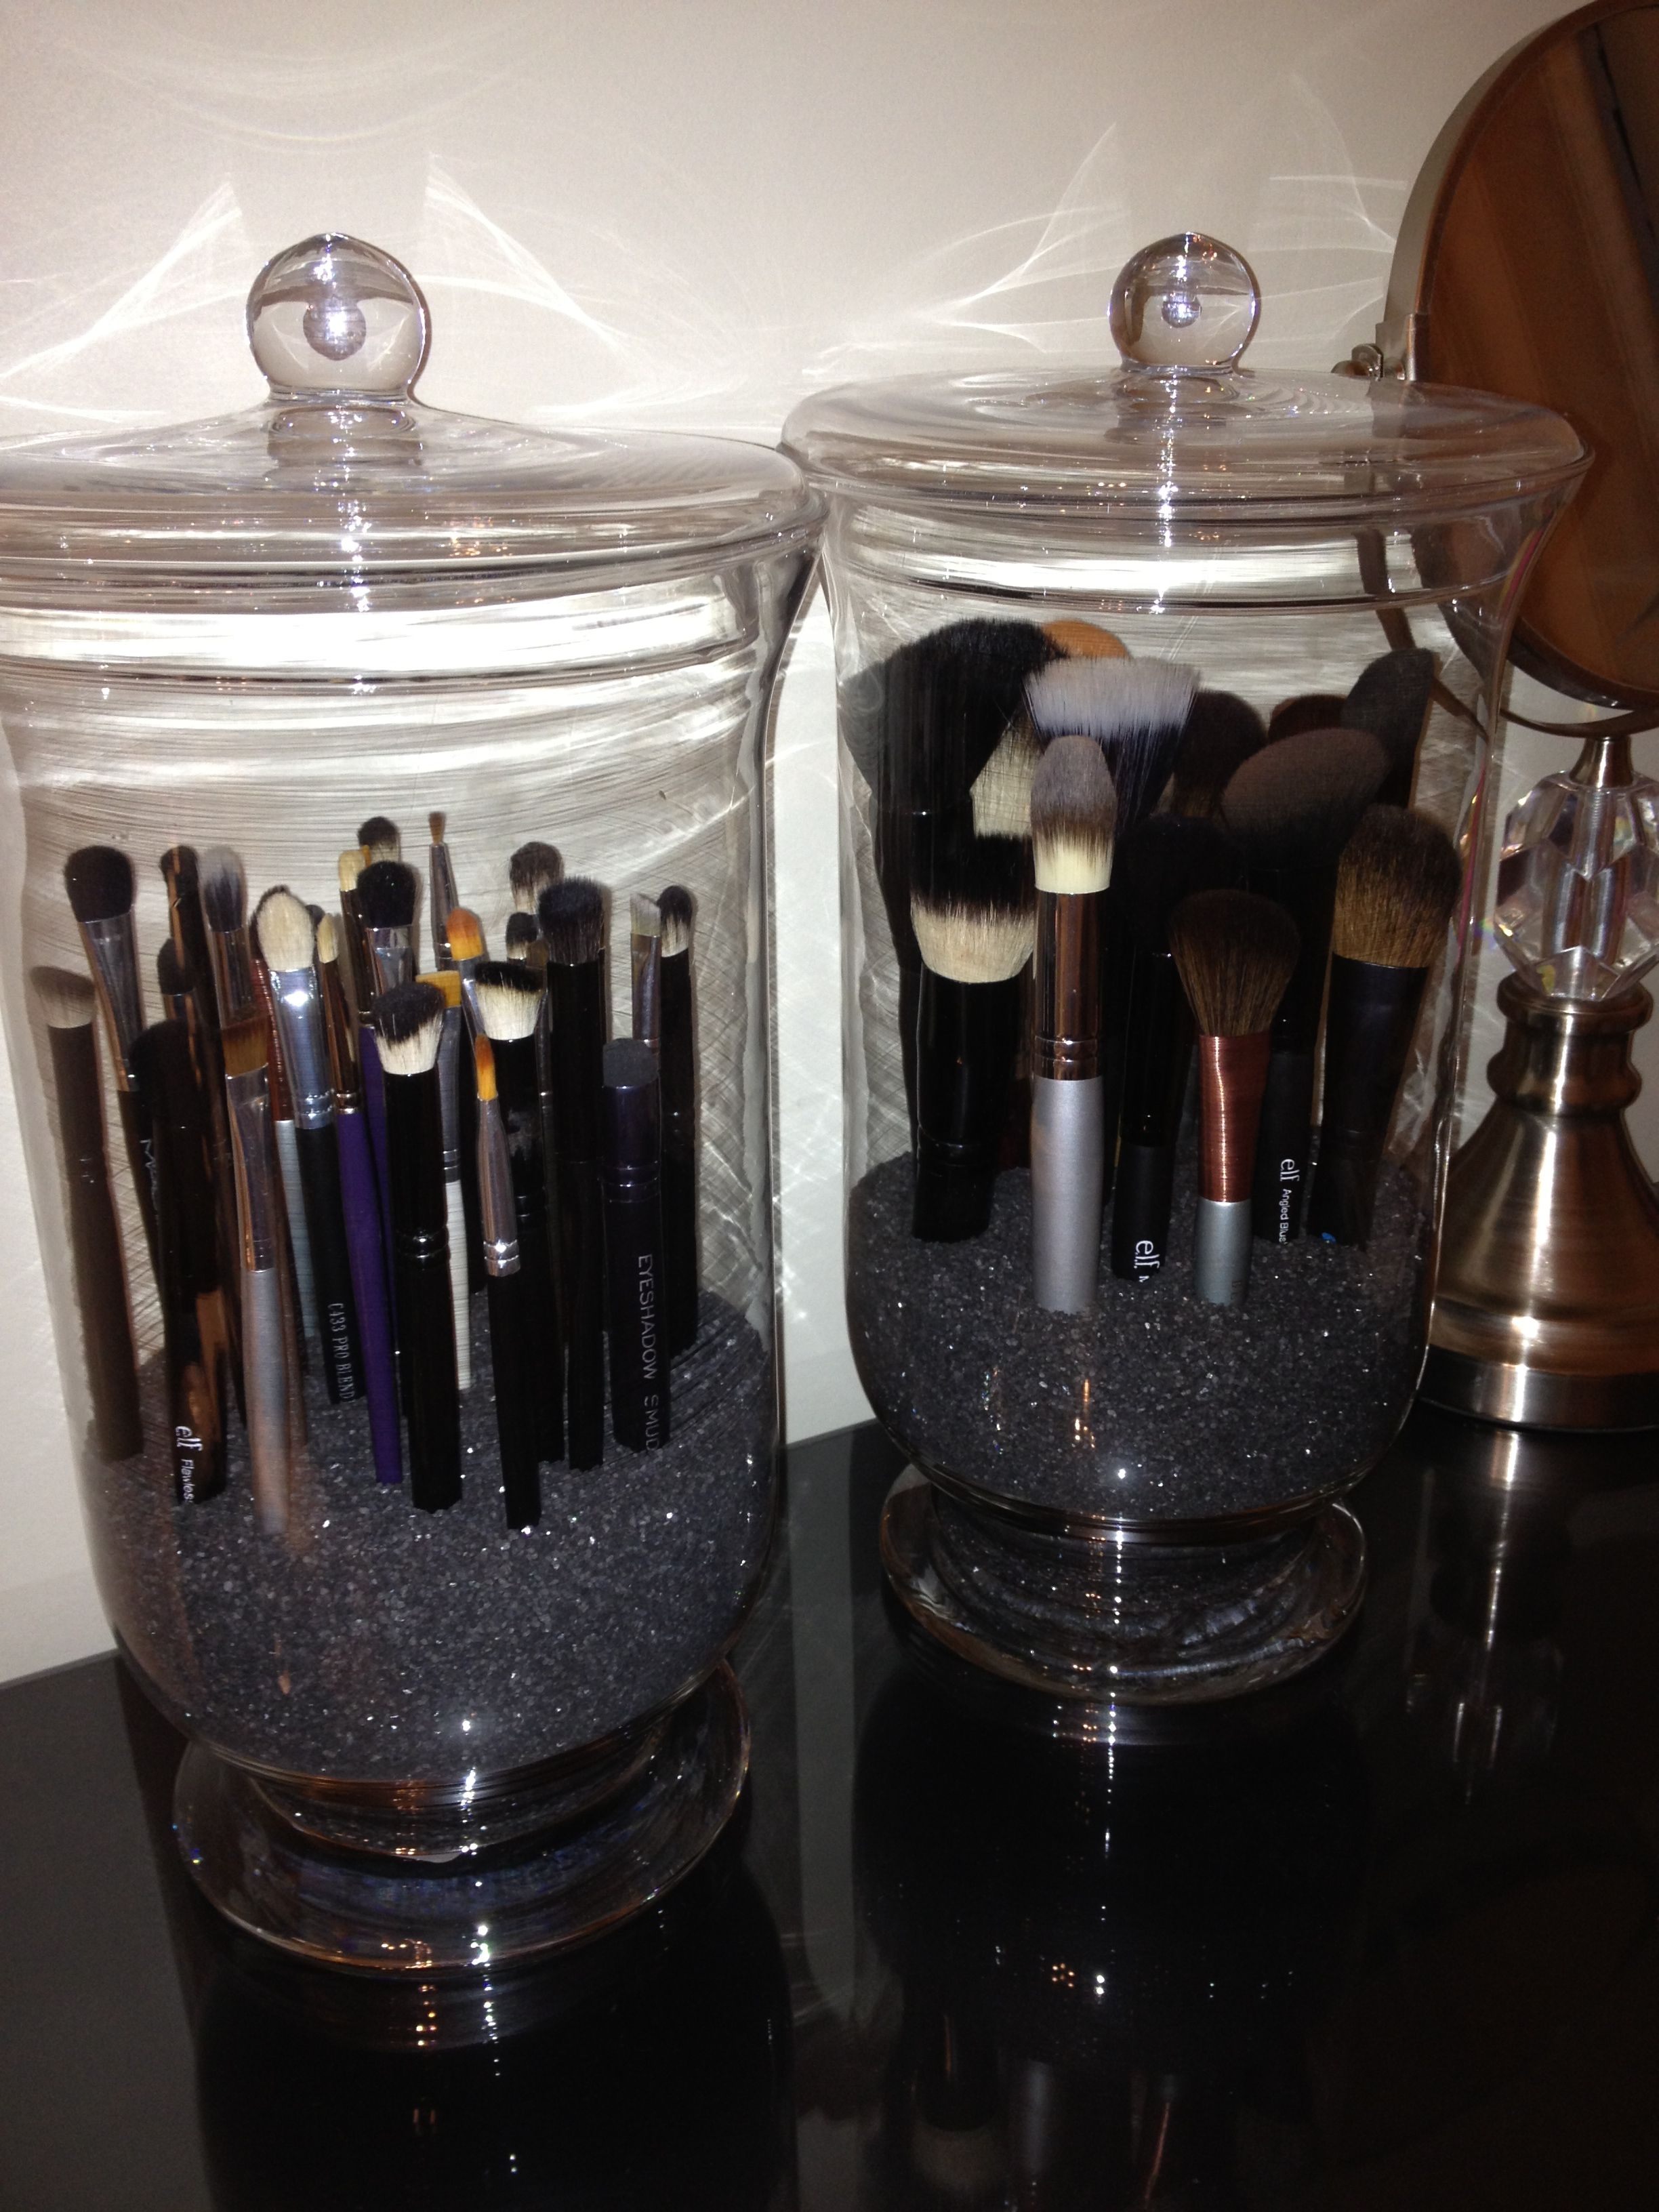 Keeping my makeup brushes dust free! Makeup brush